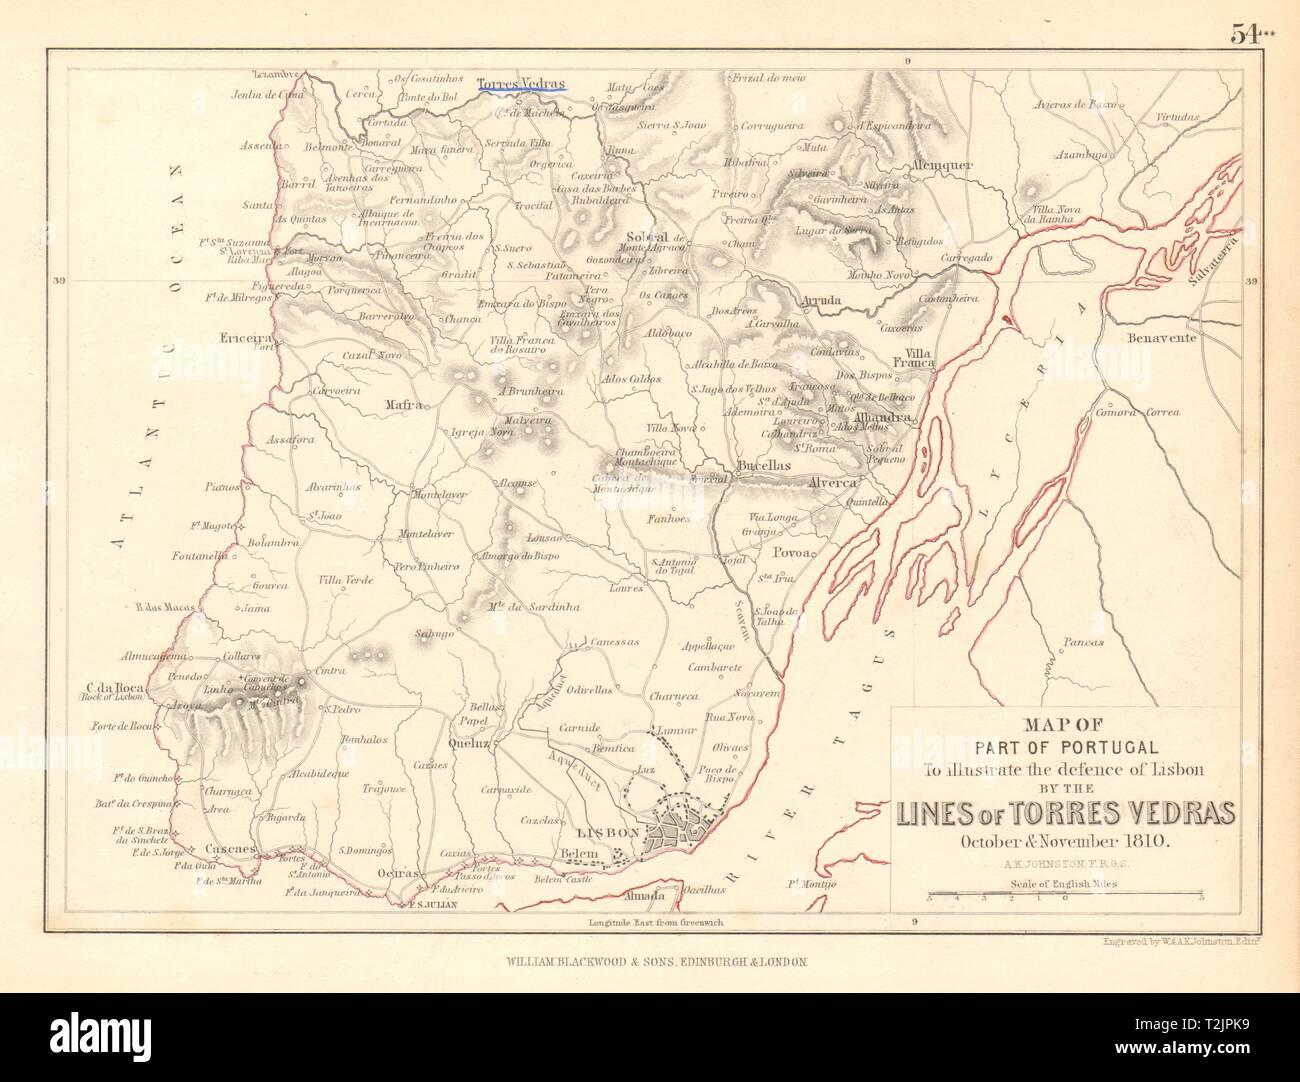 Defence of Lisbon. Lines of Torres Vedras. Oct-Nov 1810. Peninsula War 1850 map - Stock Image